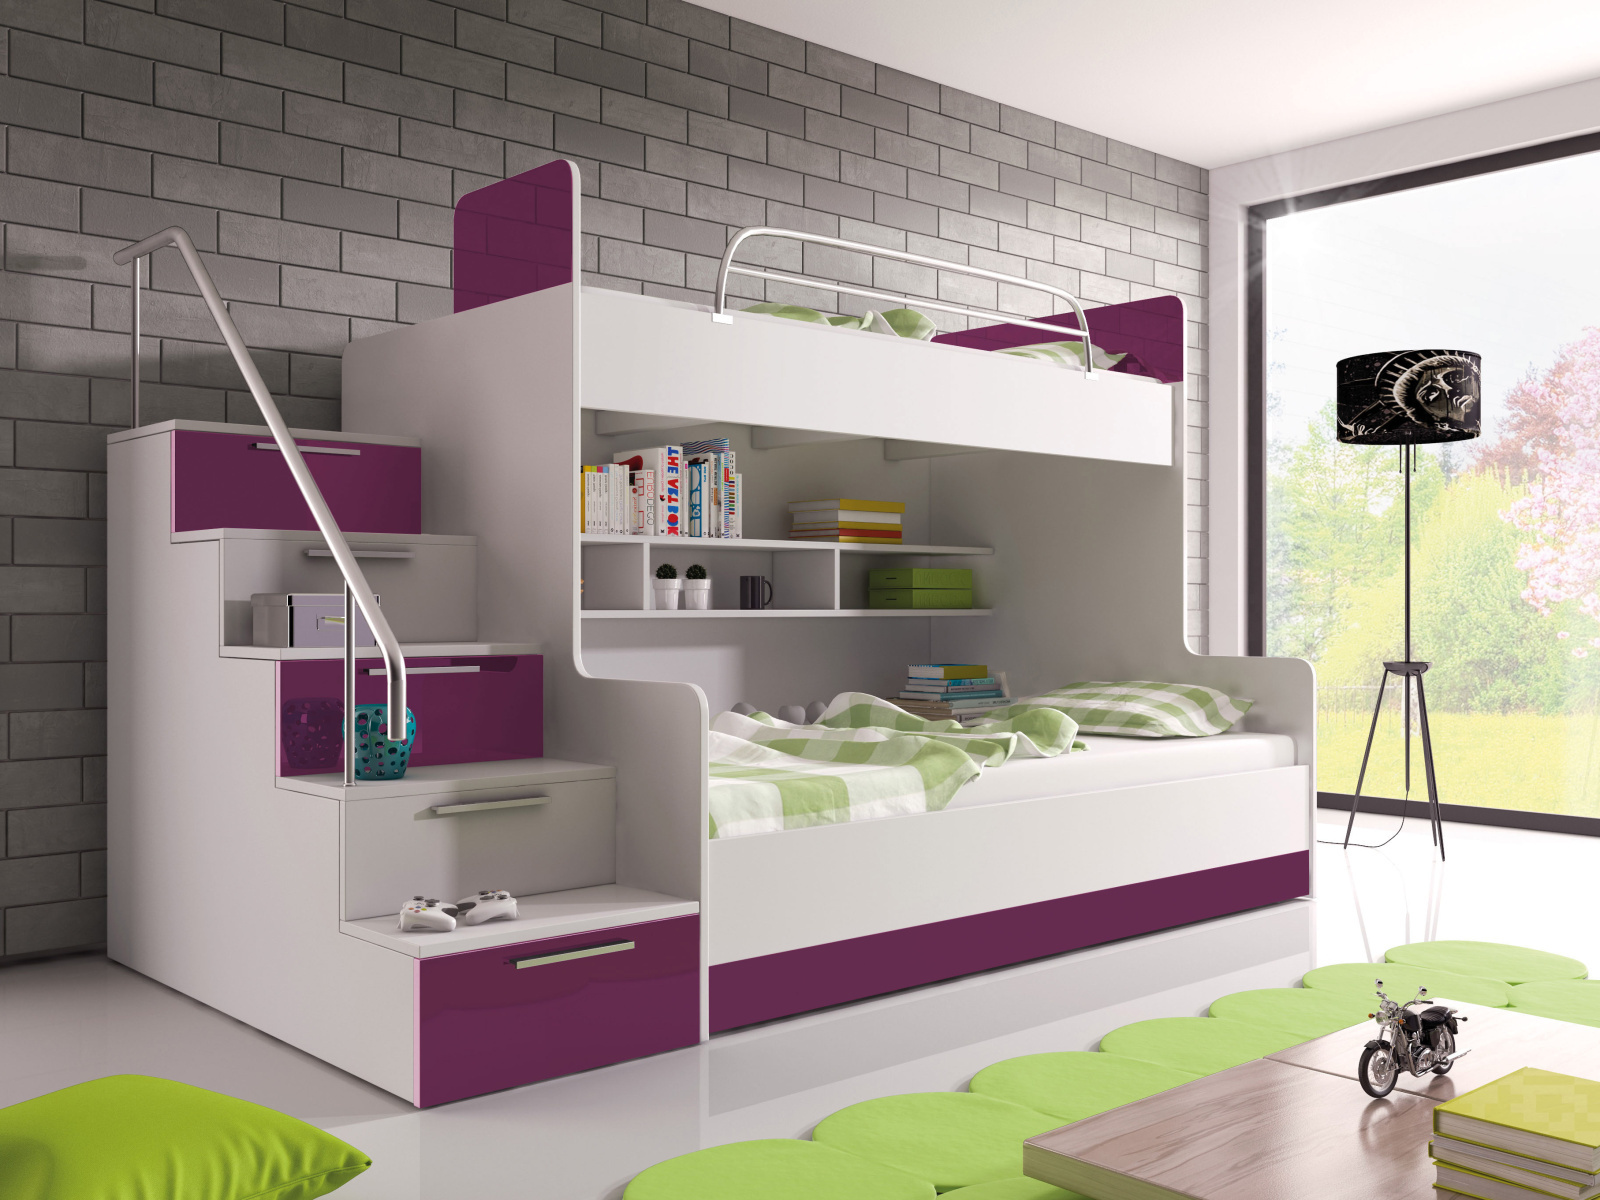 patrova postel raj nejrychlej cz. Black Bedroom Furniture Sets. Home Design Ideas